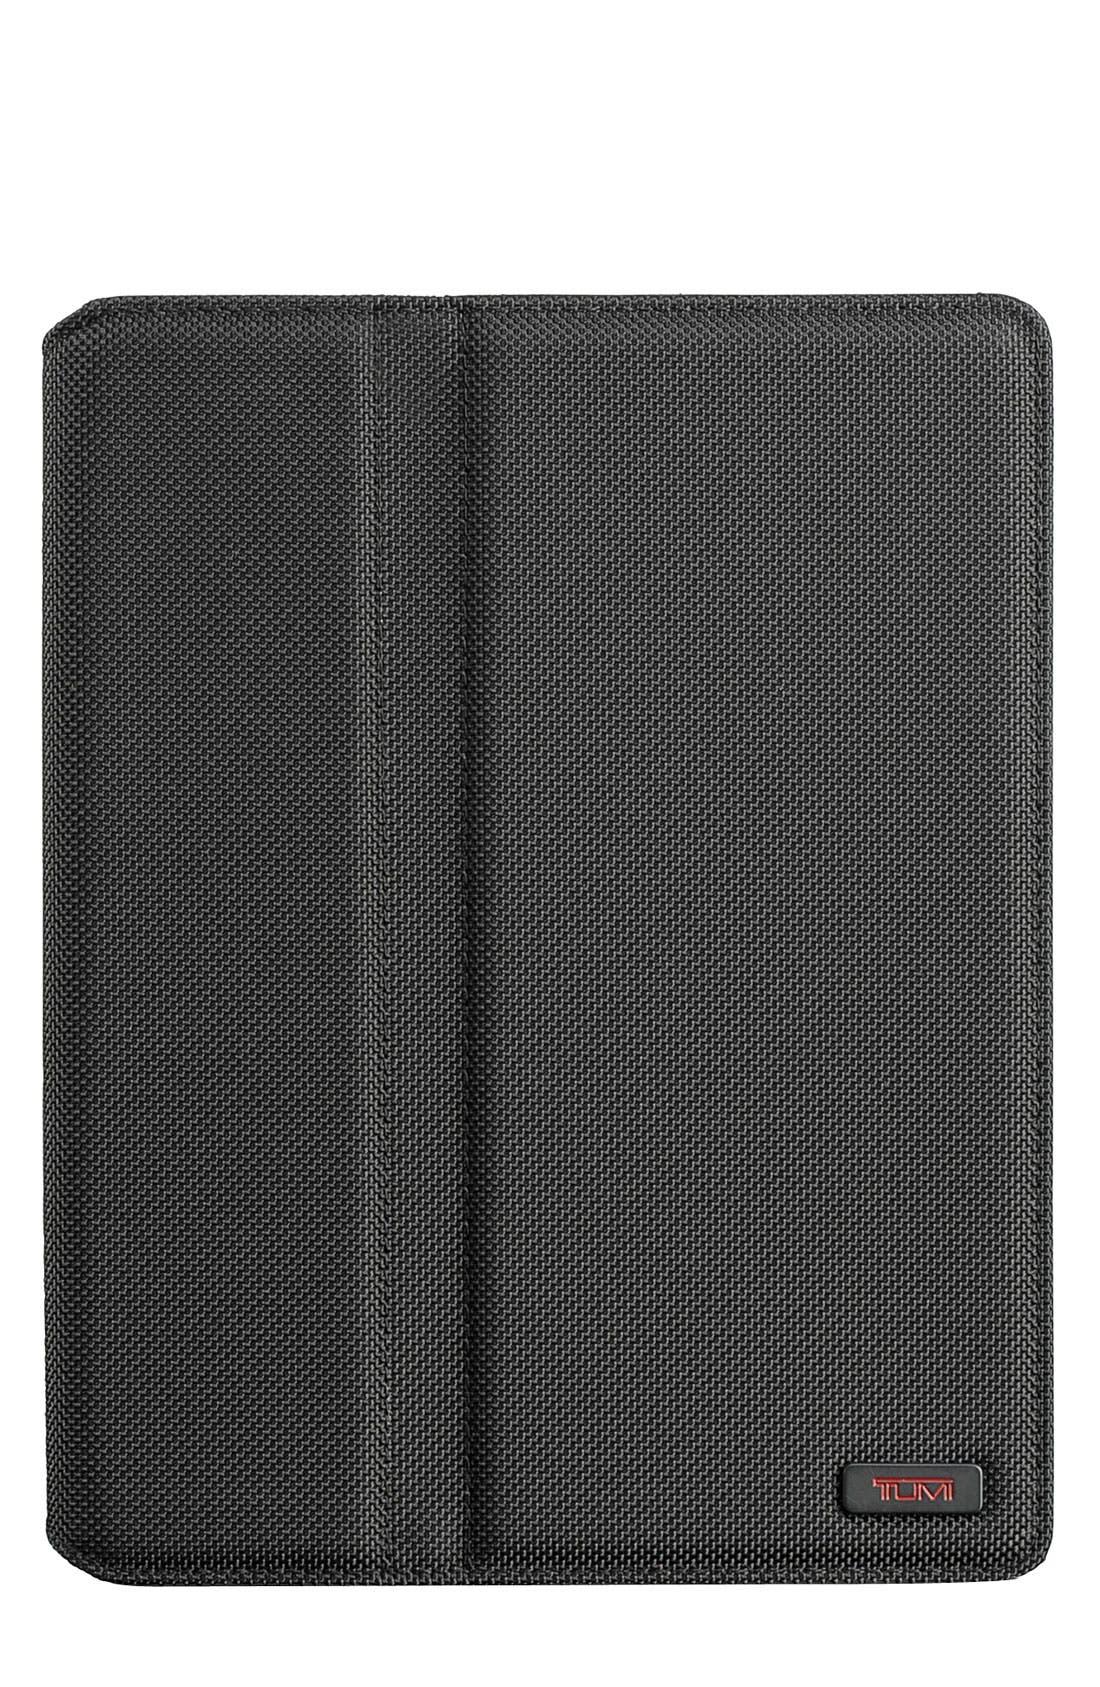 Alternate Image 1 Selected - Tumi Ballistic Nylon iPad 2 Cover